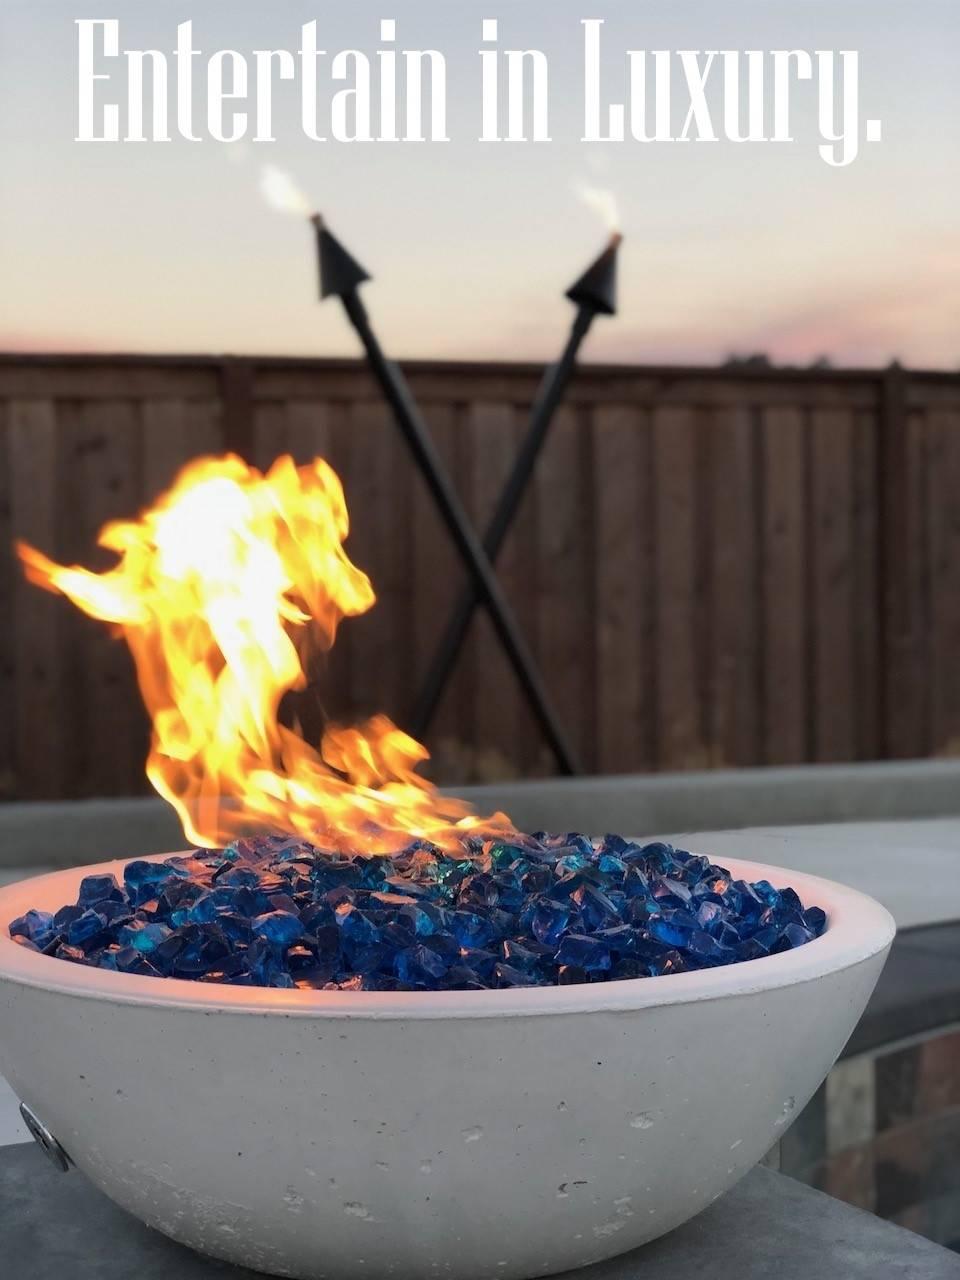 Gas Fire Bowl - Entertain in Luxury.